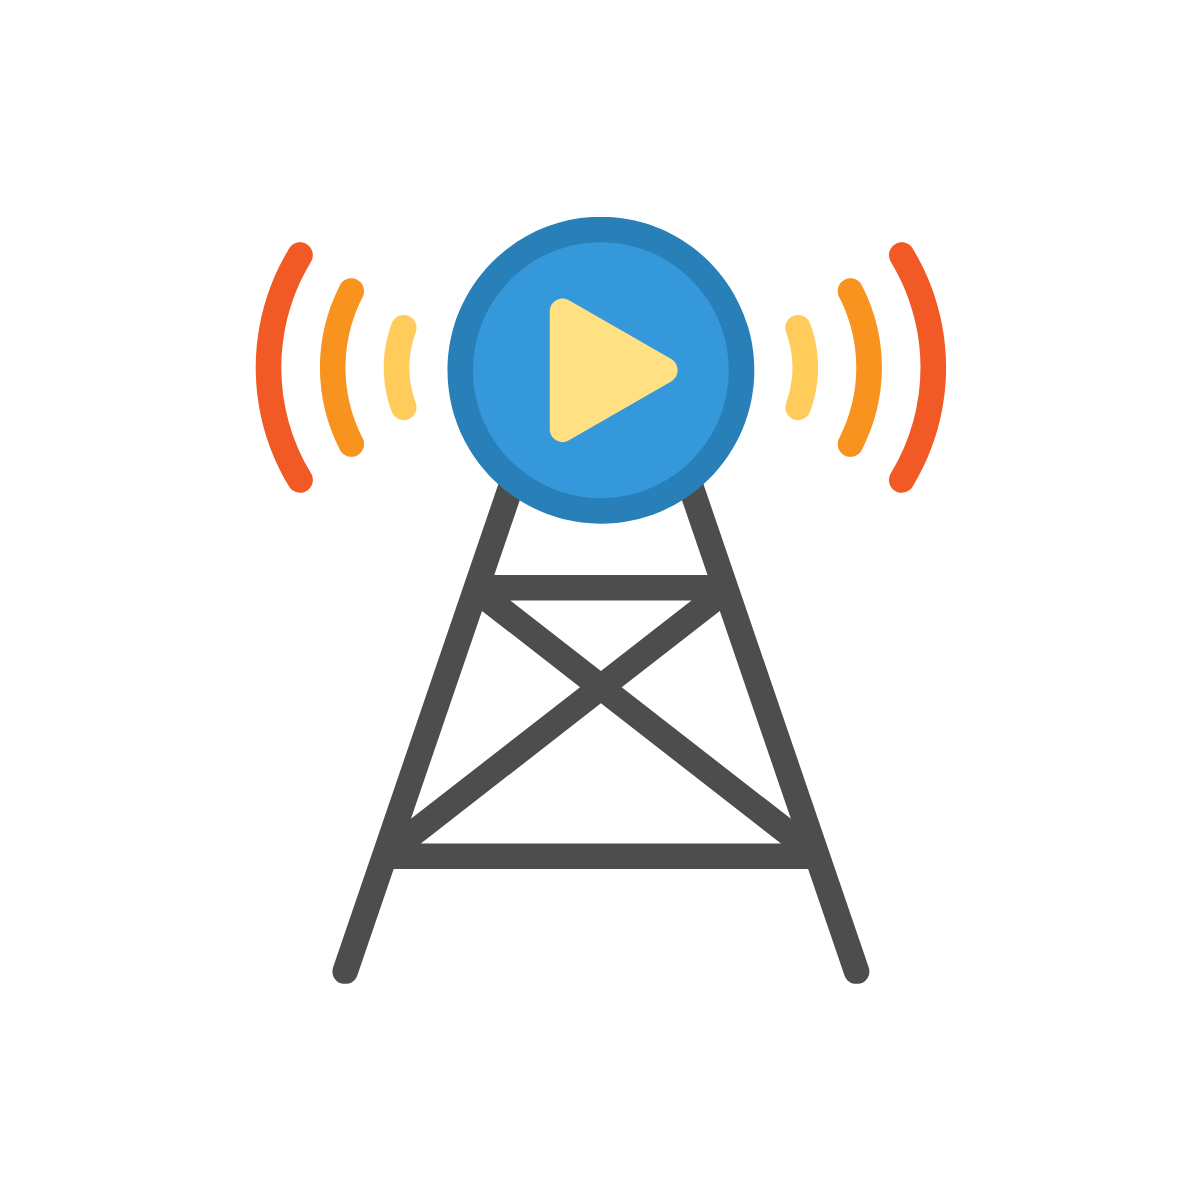 telecoms engineer icon